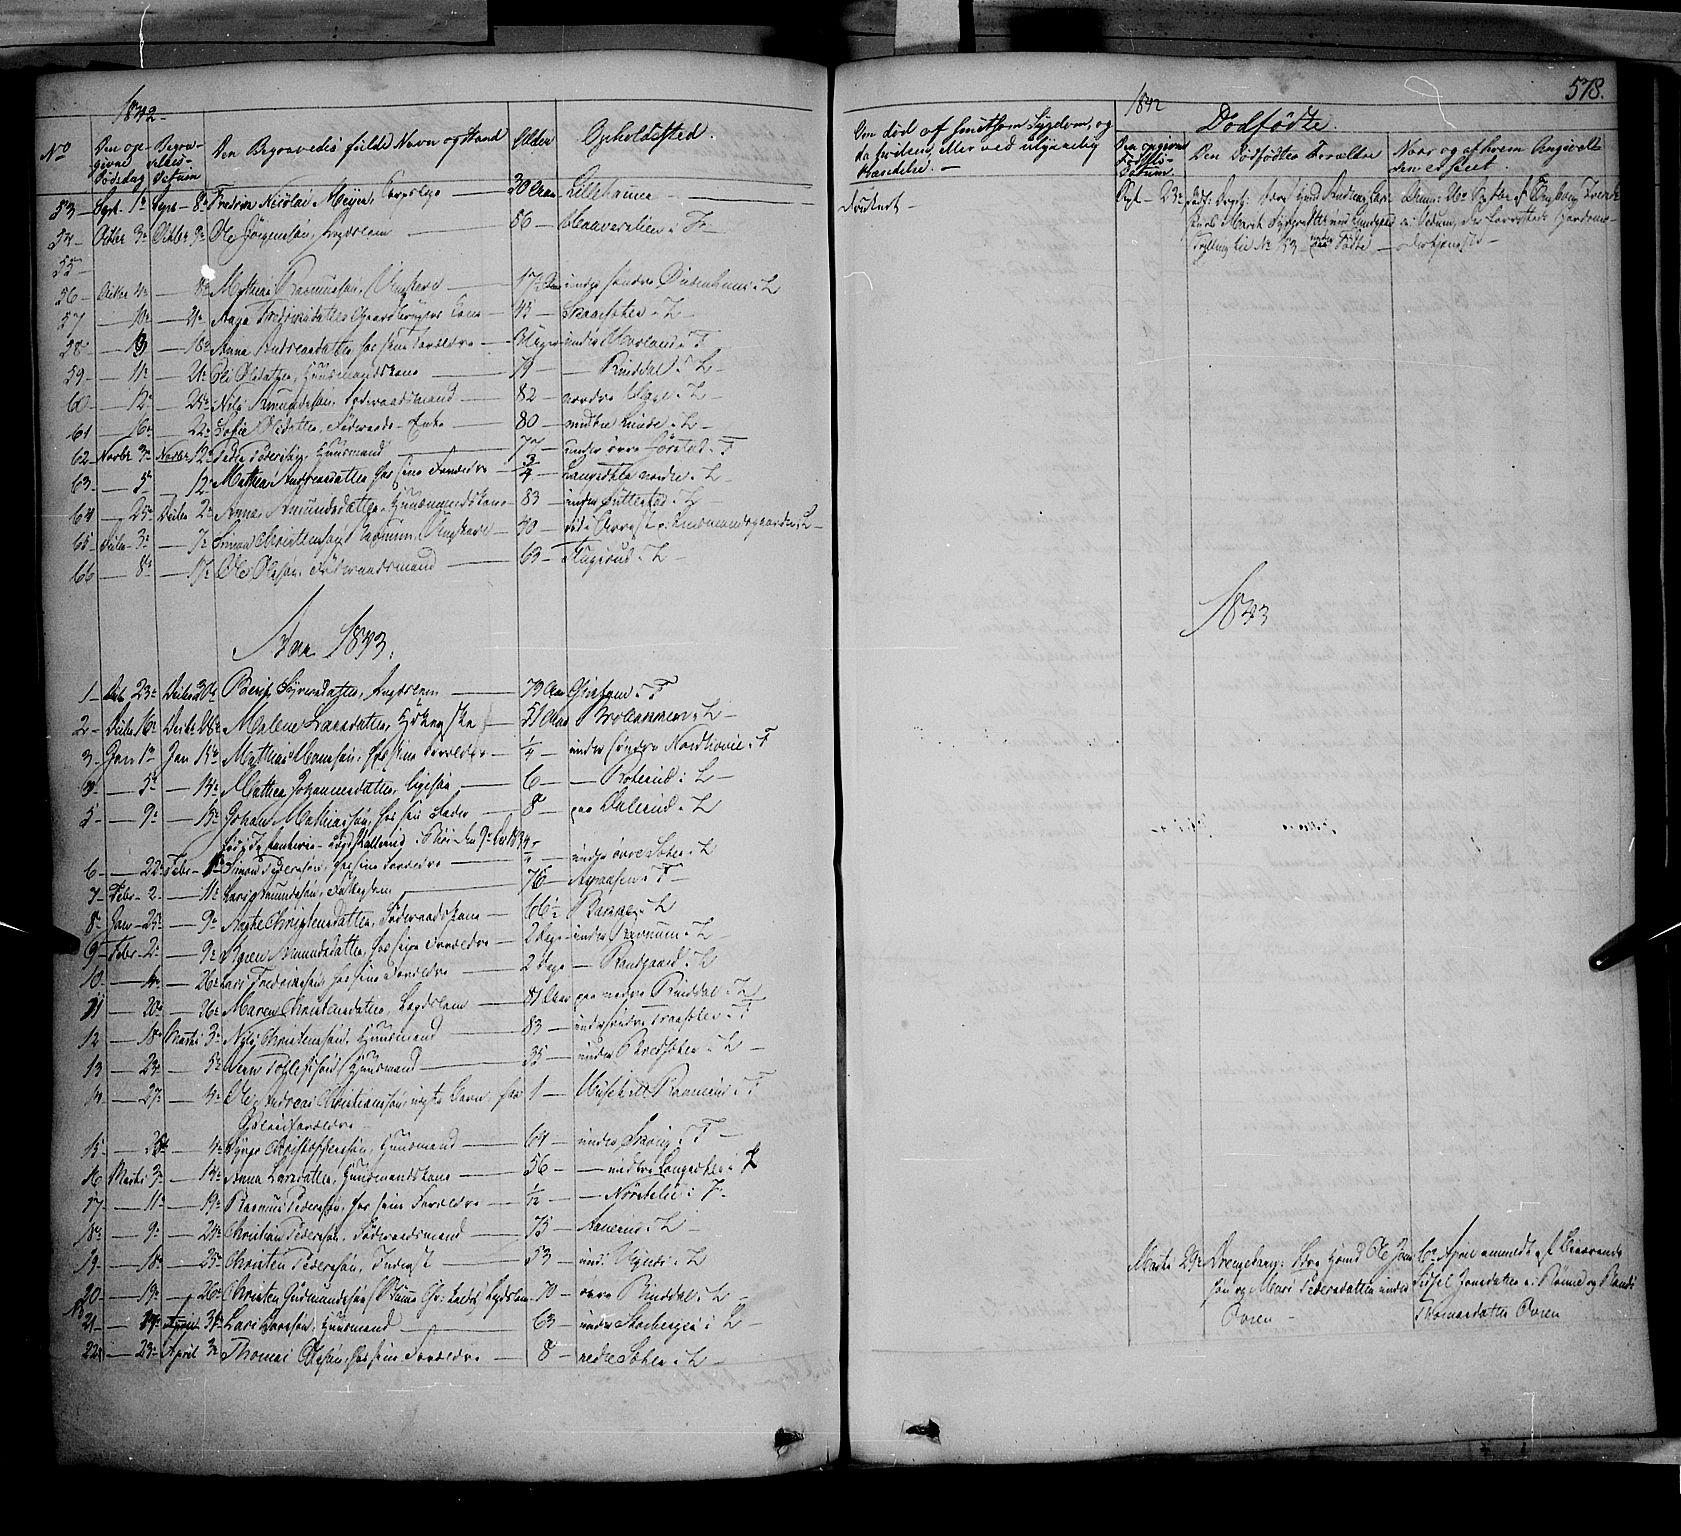 SAH, Fåberg prestekontor, Ministerialbok nr. 5, 1836-1854, s. 577-578